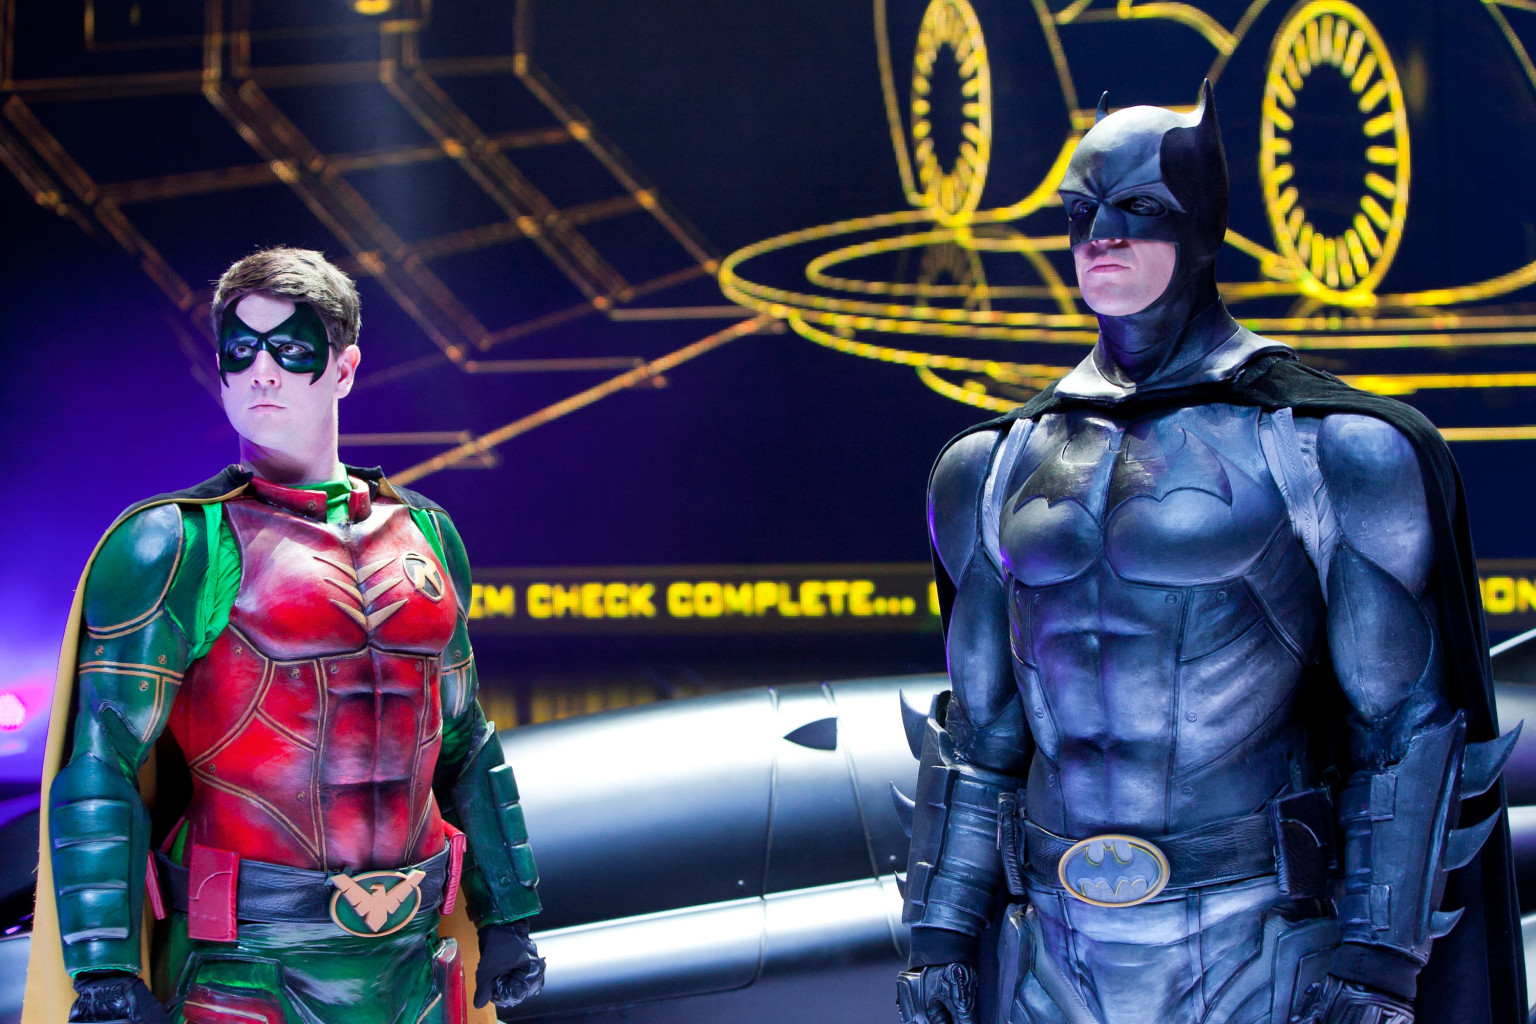 Is batman and robin gay